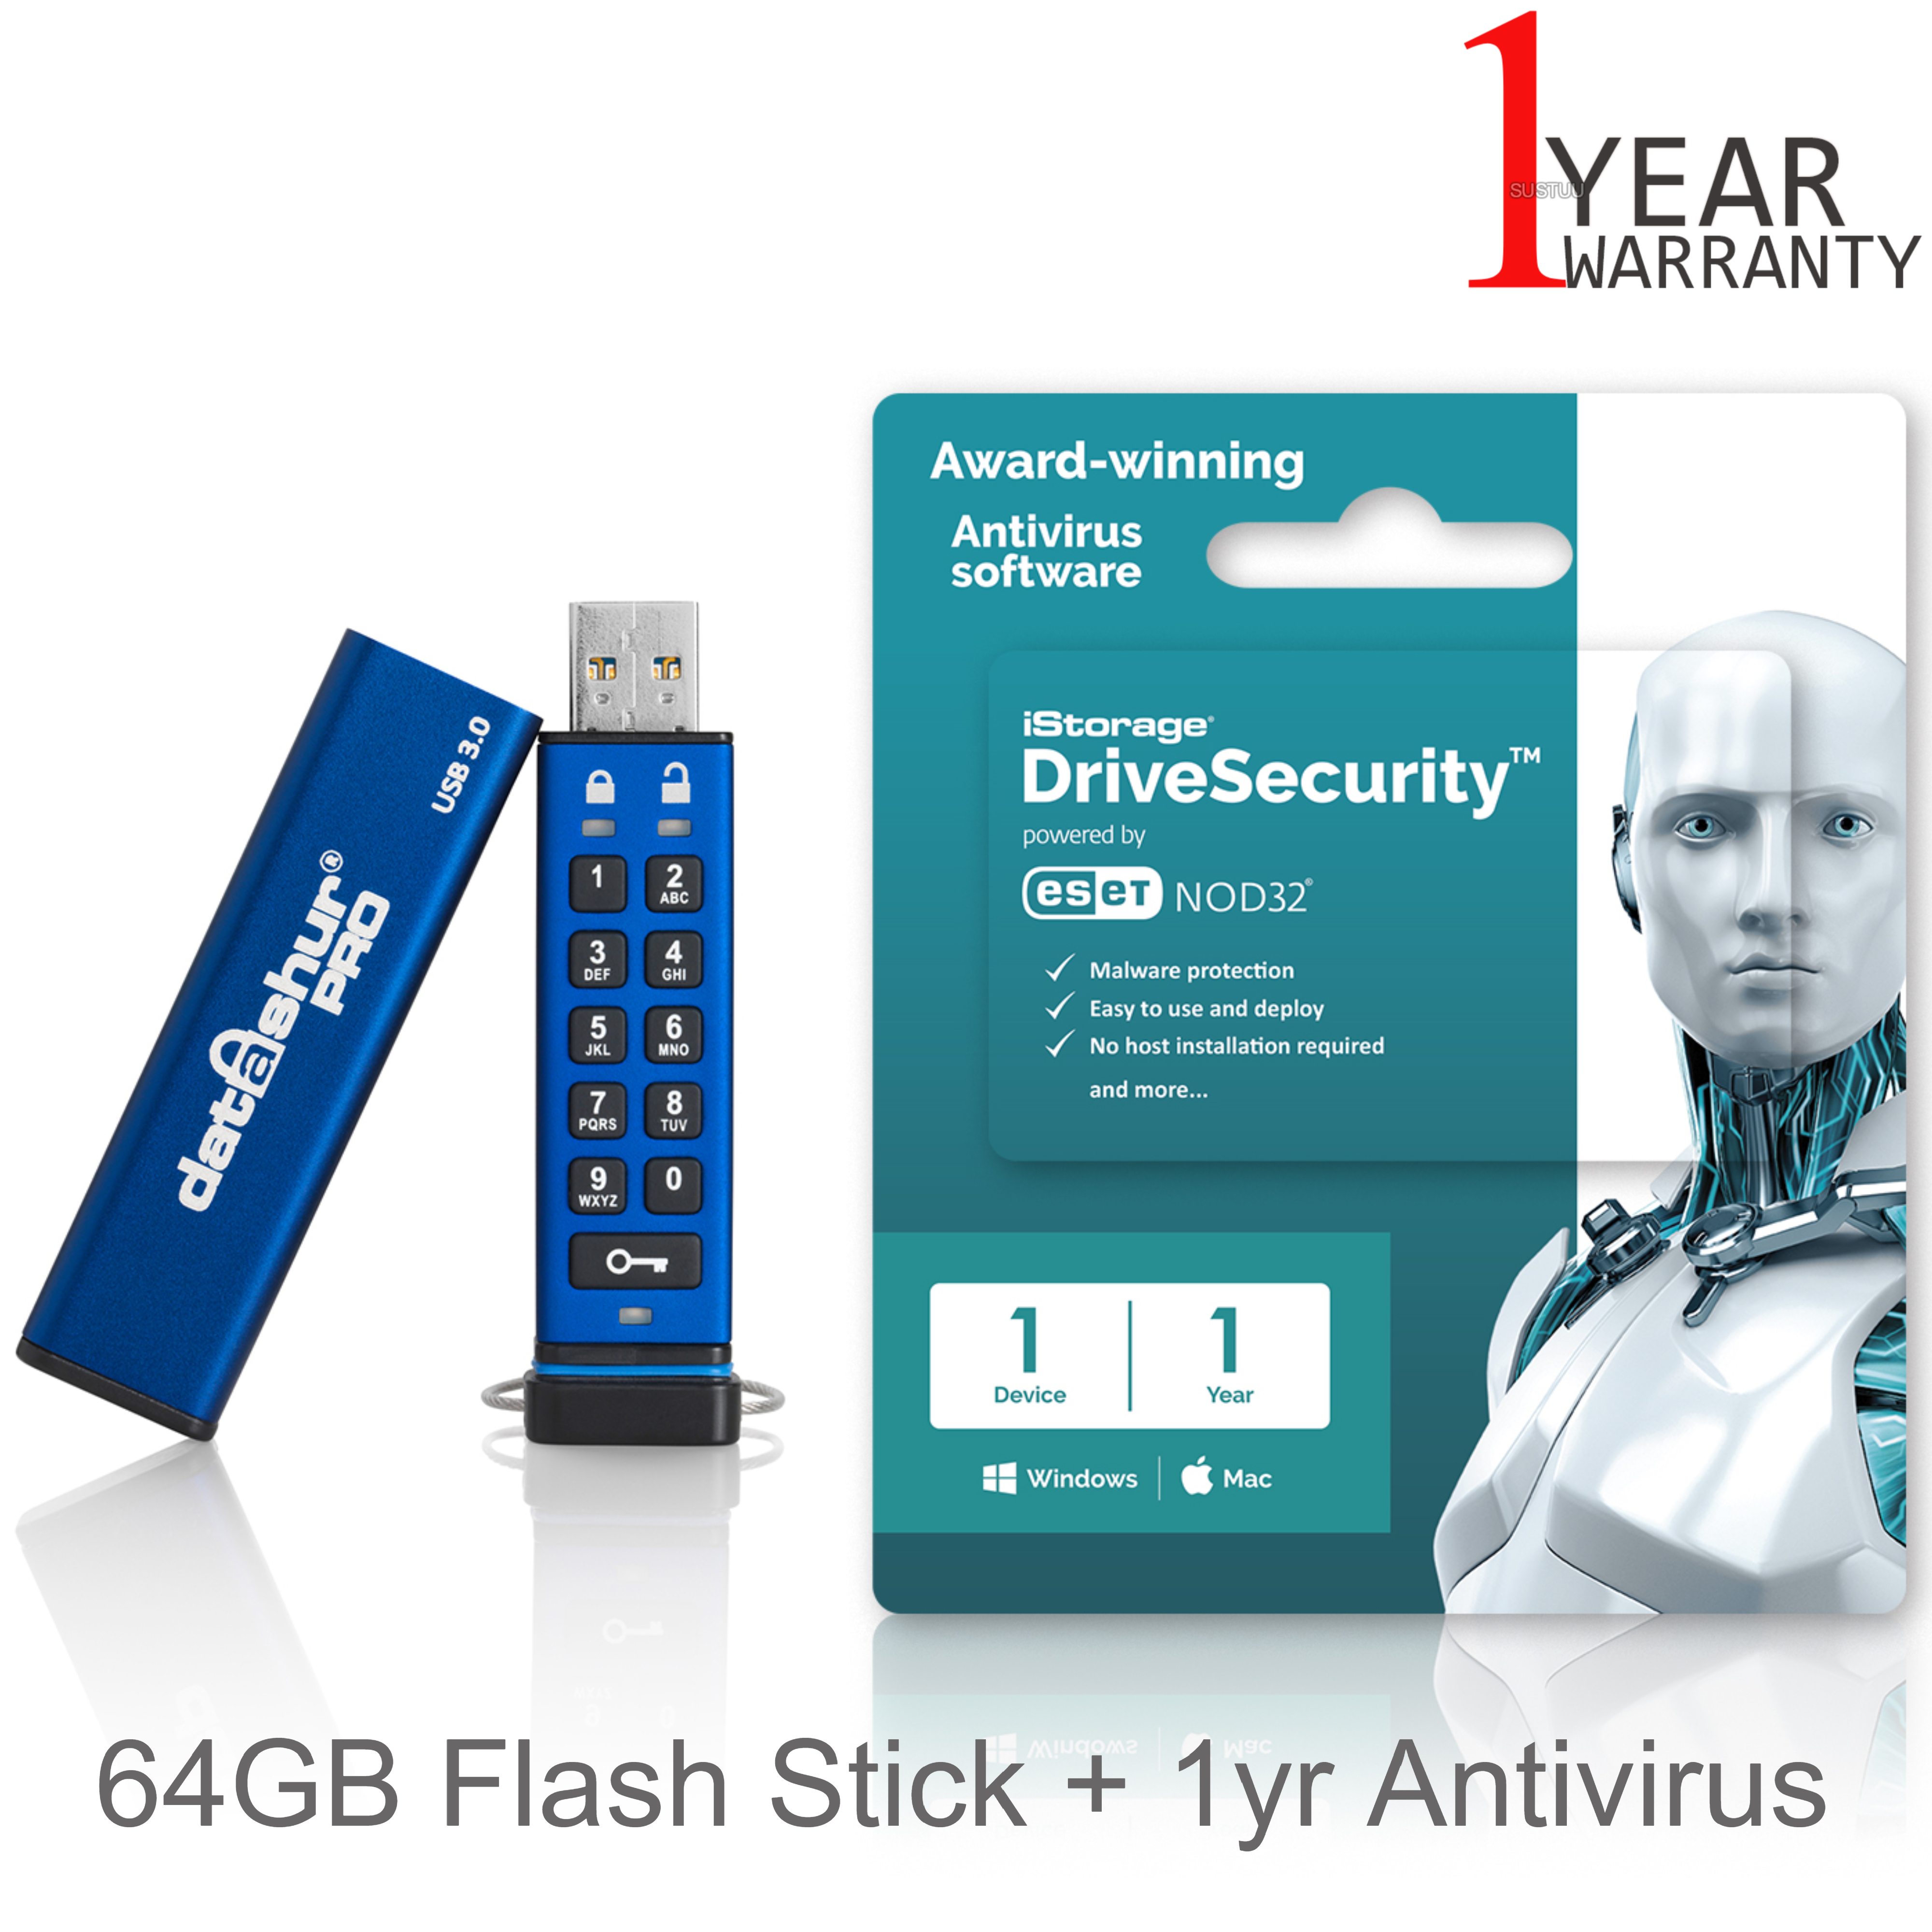 iStorage datAshur Pro 64GB Flash Stick/ Pen Memory Drive + 1yr Antivirus Licence